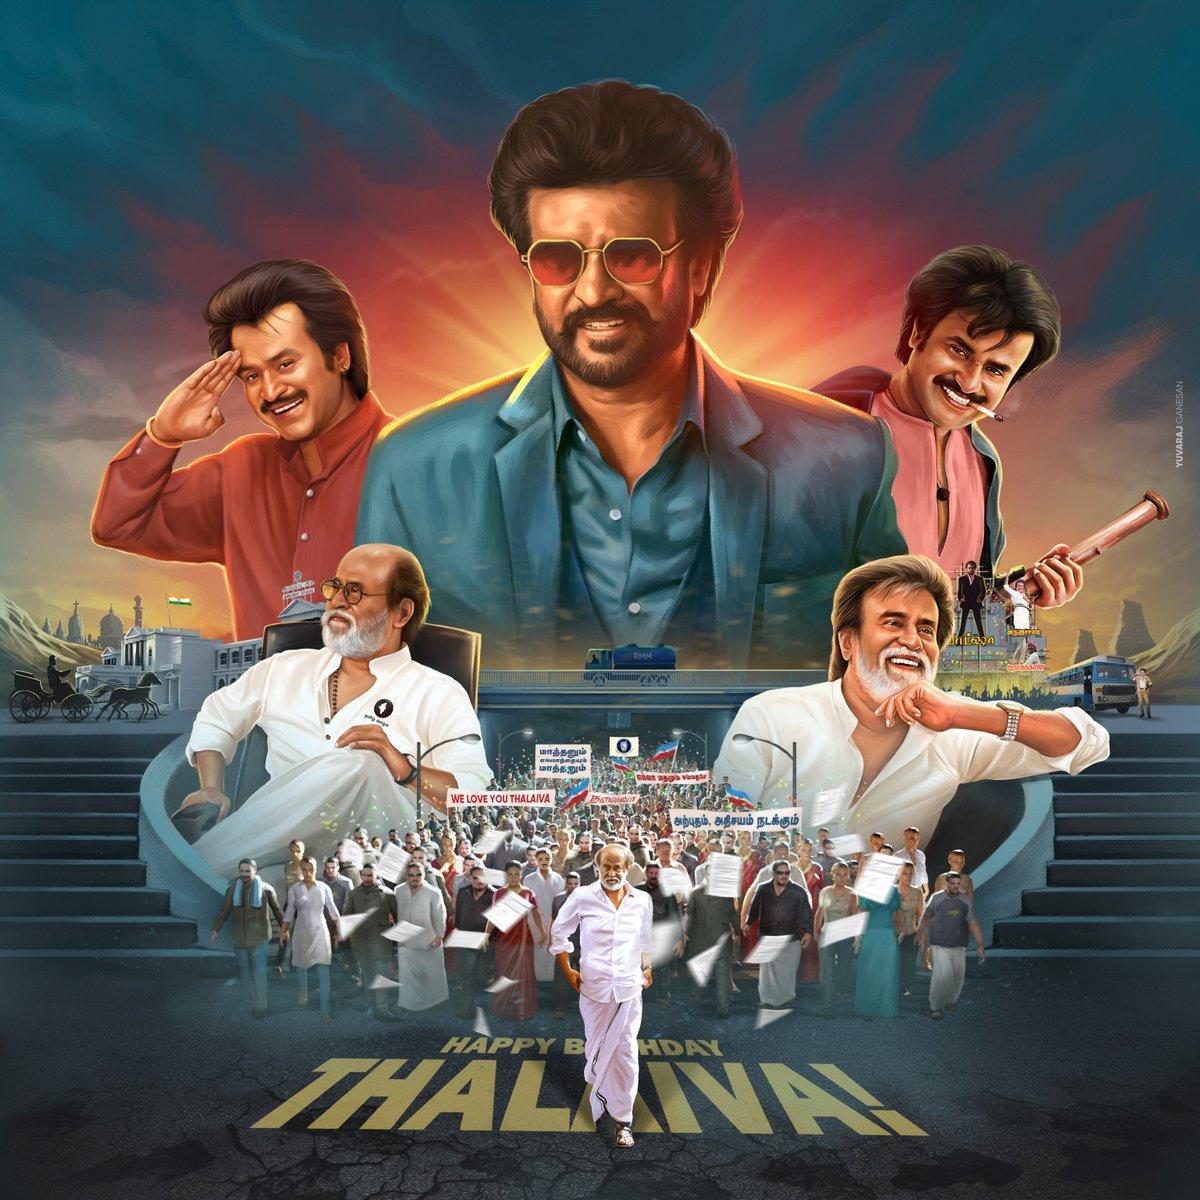 Our CDP Team confirmed all the celebs ♥️🤘  1. PRO Harish 2. Vishnu - @aksrfrajini 3. Santosh - @Memedons_Offl 4. Nathan - @ShaSherNat 5. Khousik - @K_Koushik99 6. Pokkiri Raja - @RajiniFC 7. Siraj - @RajiniFansTeam1 8. Laxman - @Laxman_ssrk  #HBDSuperstarRajinikanth #Annaatthe